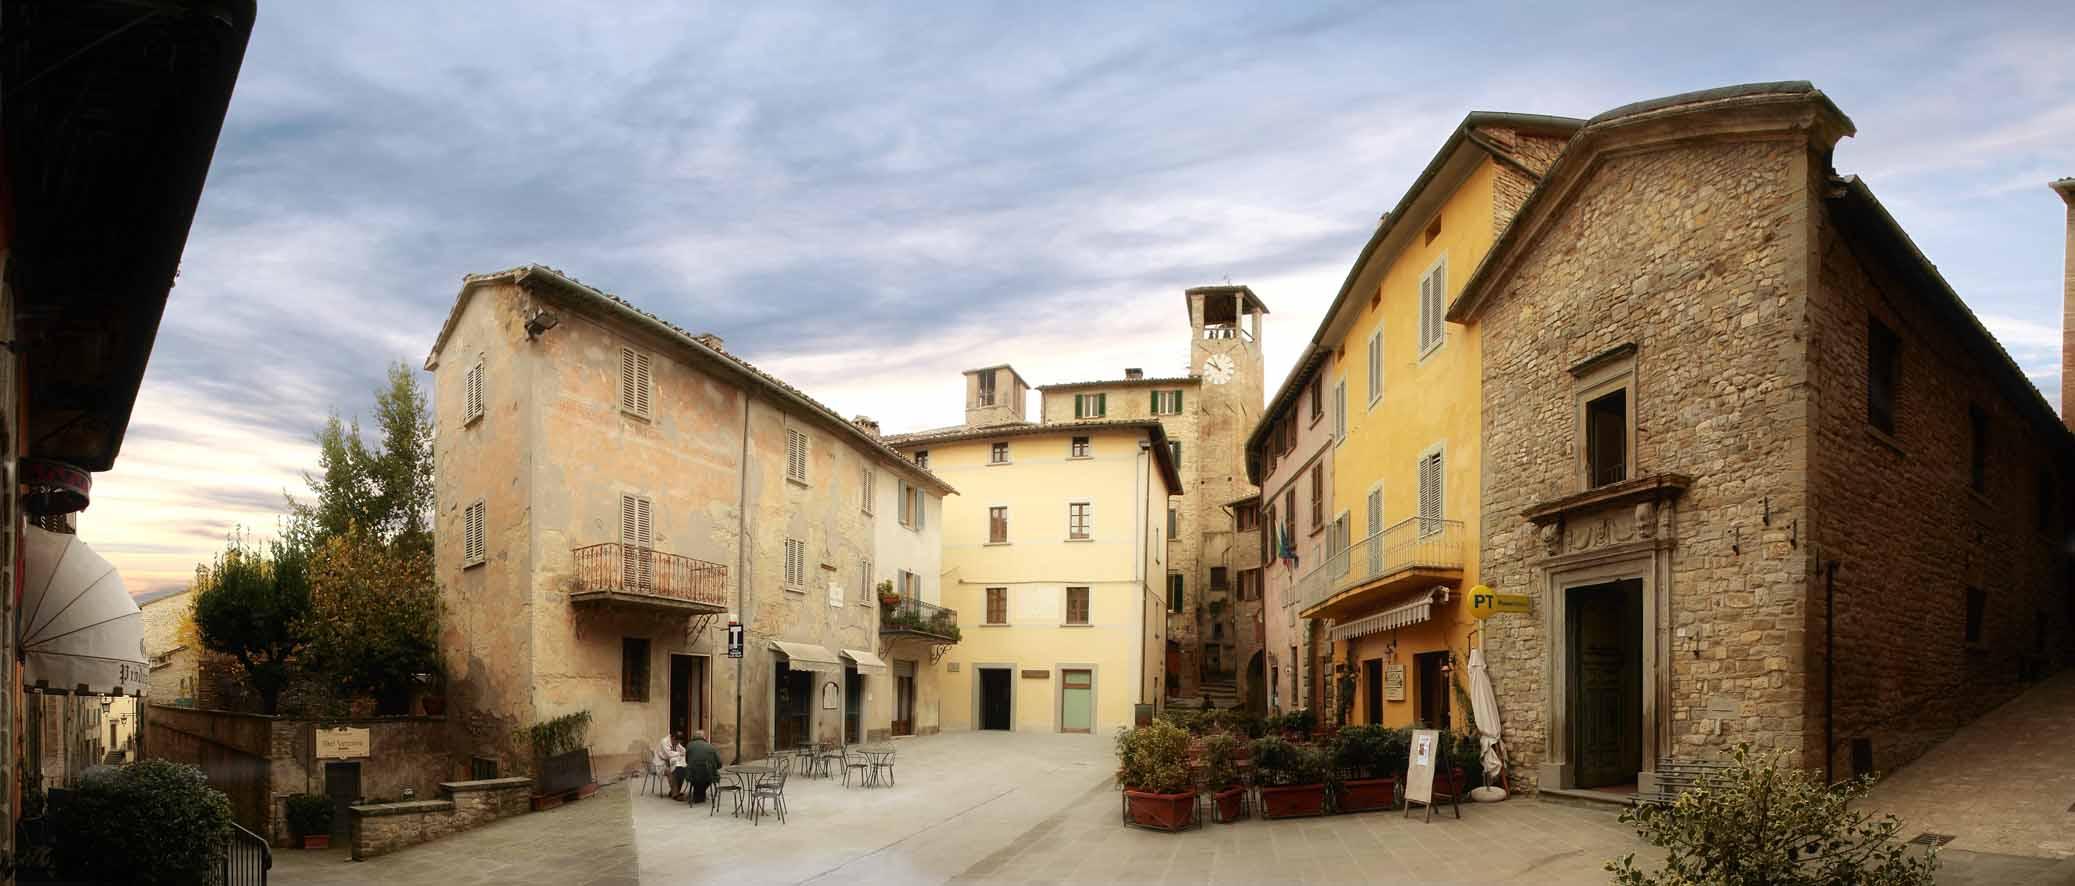 Piazza Montone